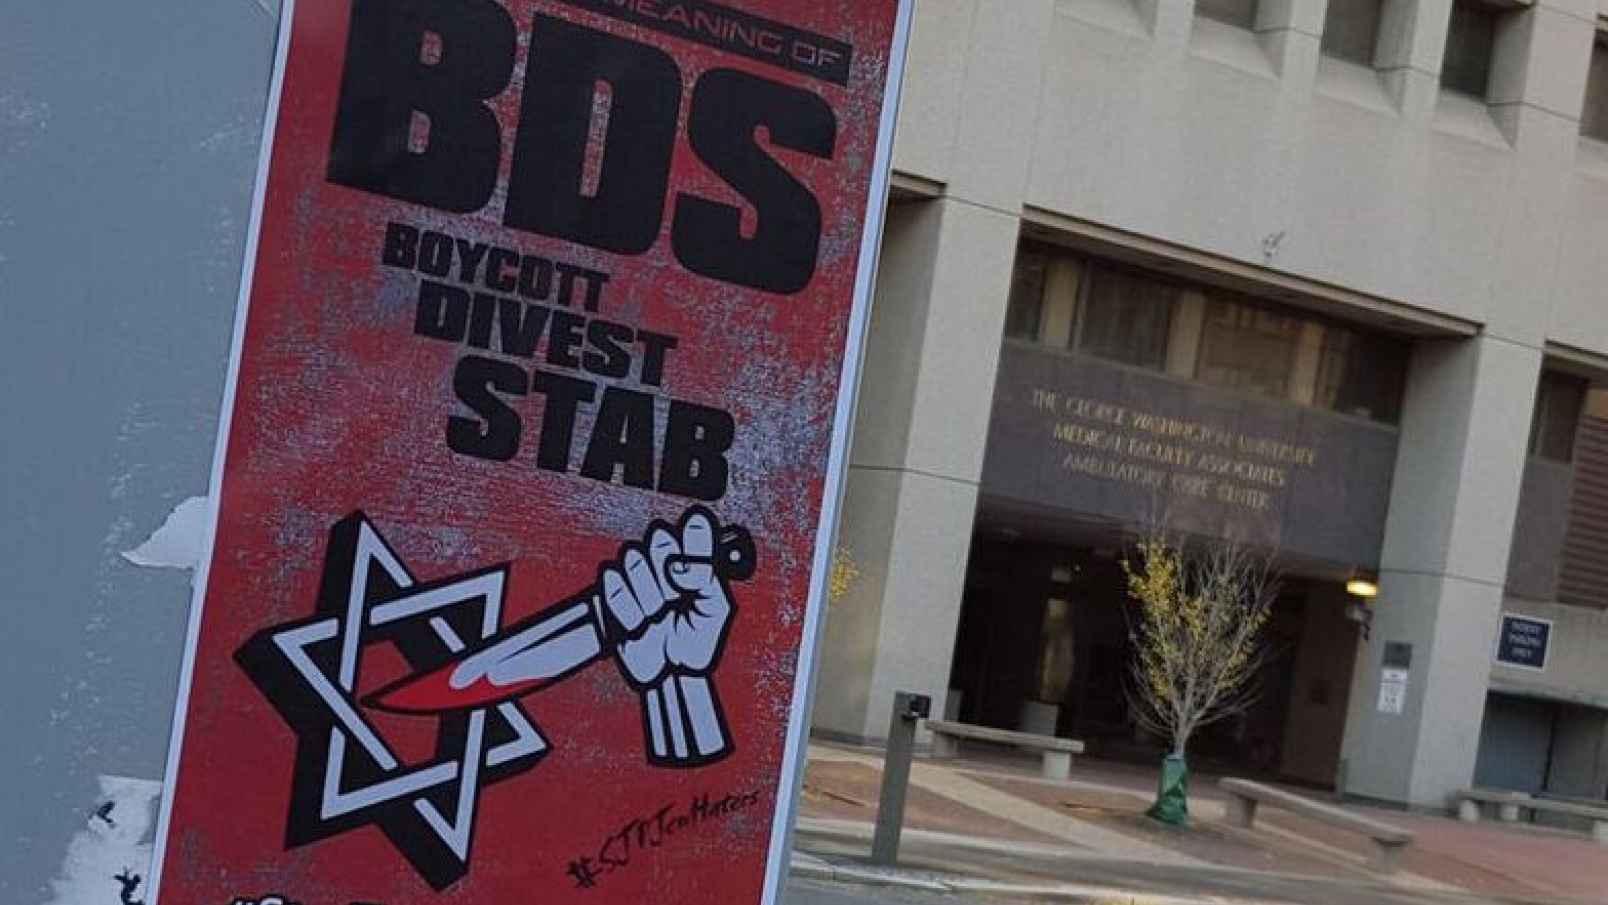 http://jtf.org/wp-content/uploads/2015/11/bds_boycott_divest_stab_jews.jpg